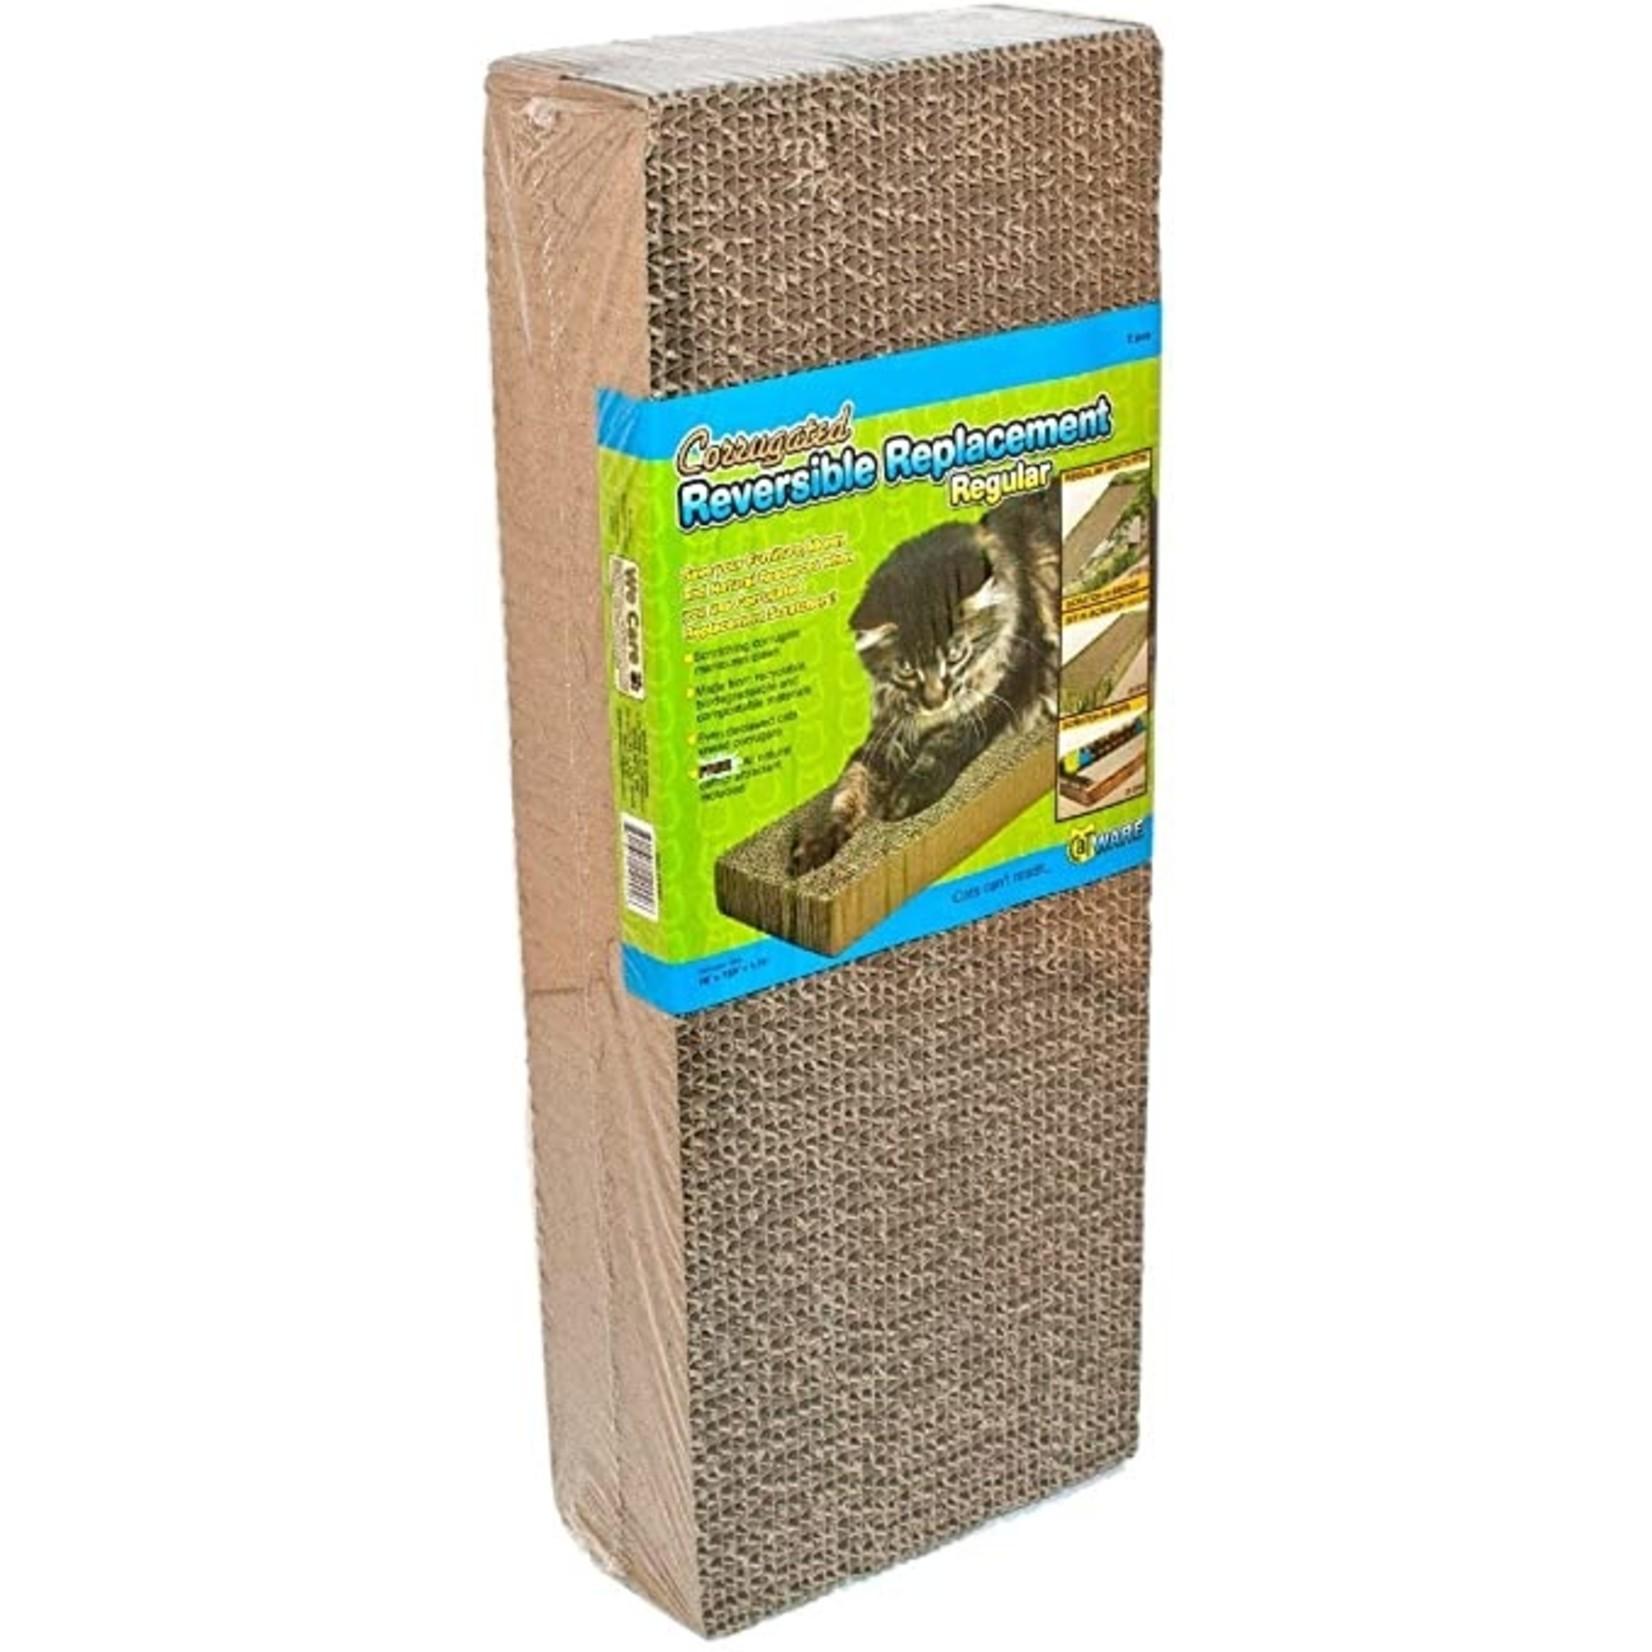 Cat Scratchy Corrugated Reversible Replacement +Catnip Single 2pcs